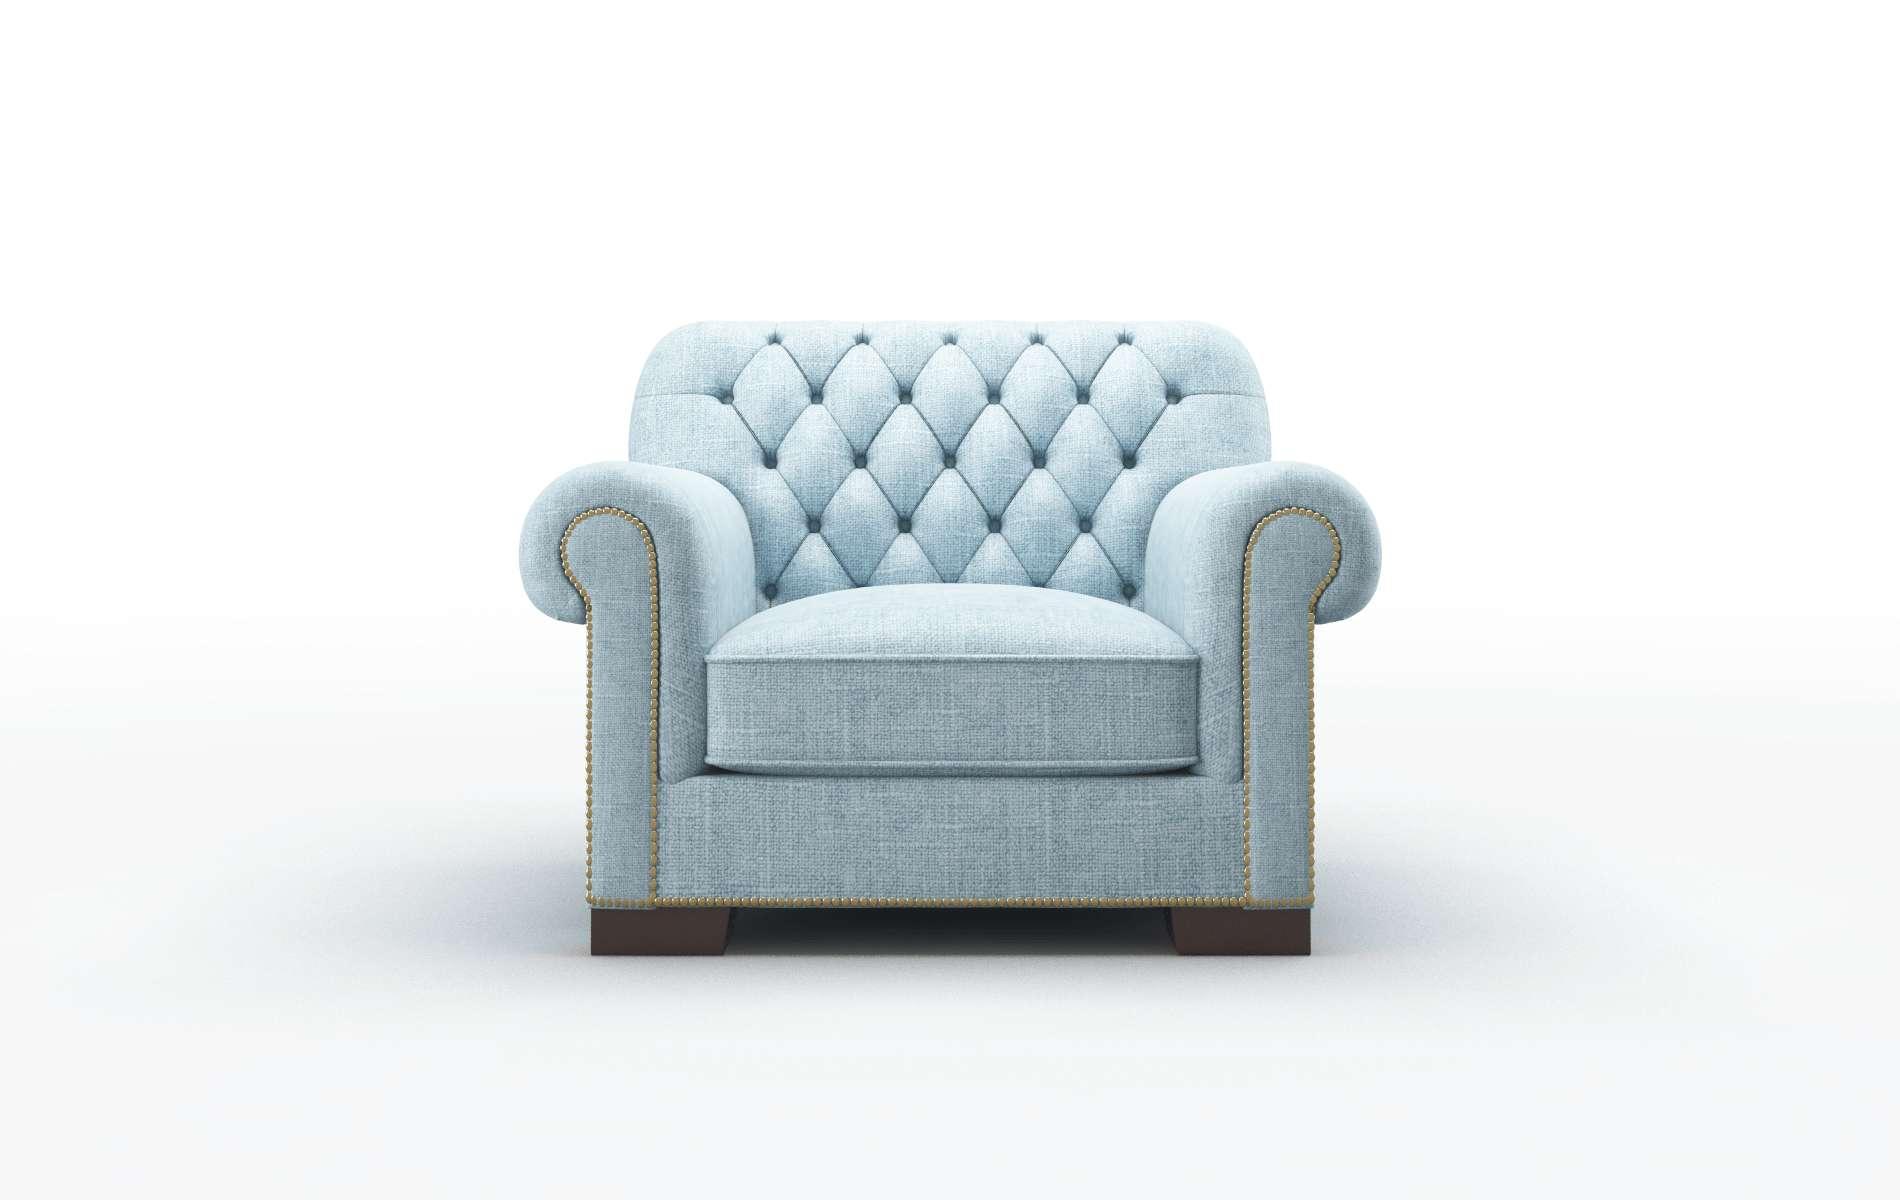 Chester Atlas Turquoise chair espresso legs